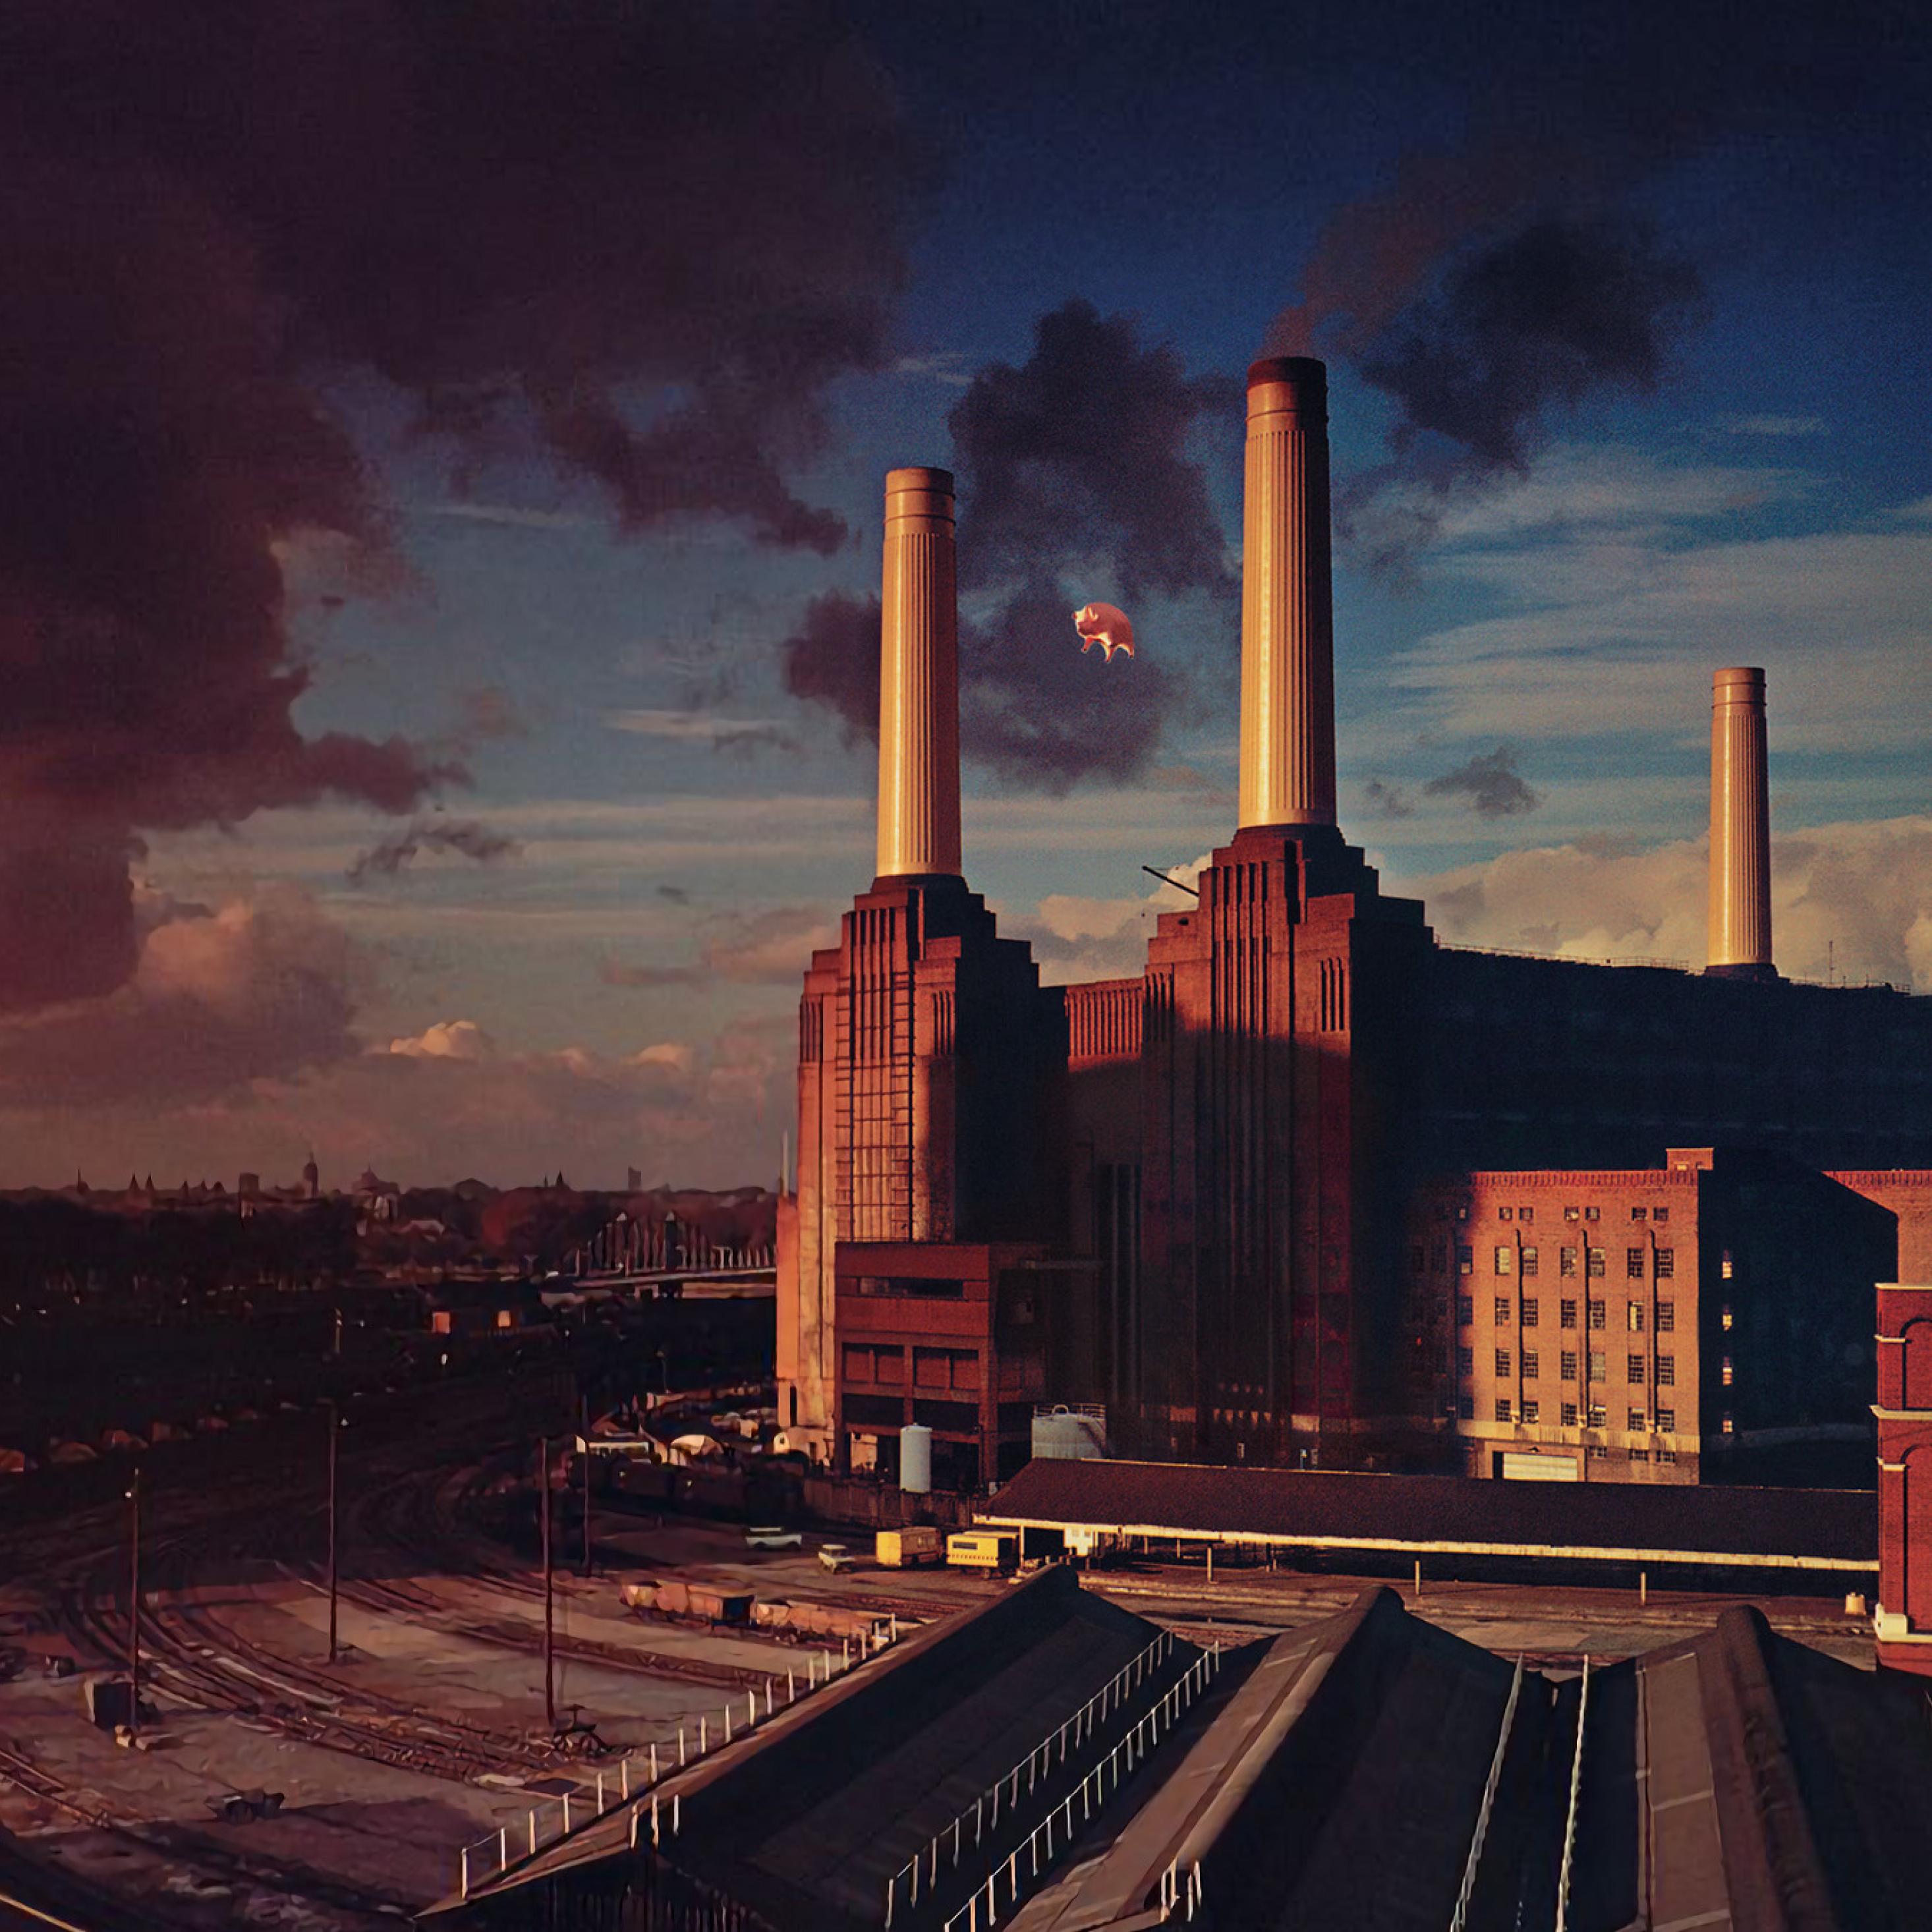 Pink Floyd Animals Album Cover, Full HD 2K Wallpaper  Pink Floyd Anim...